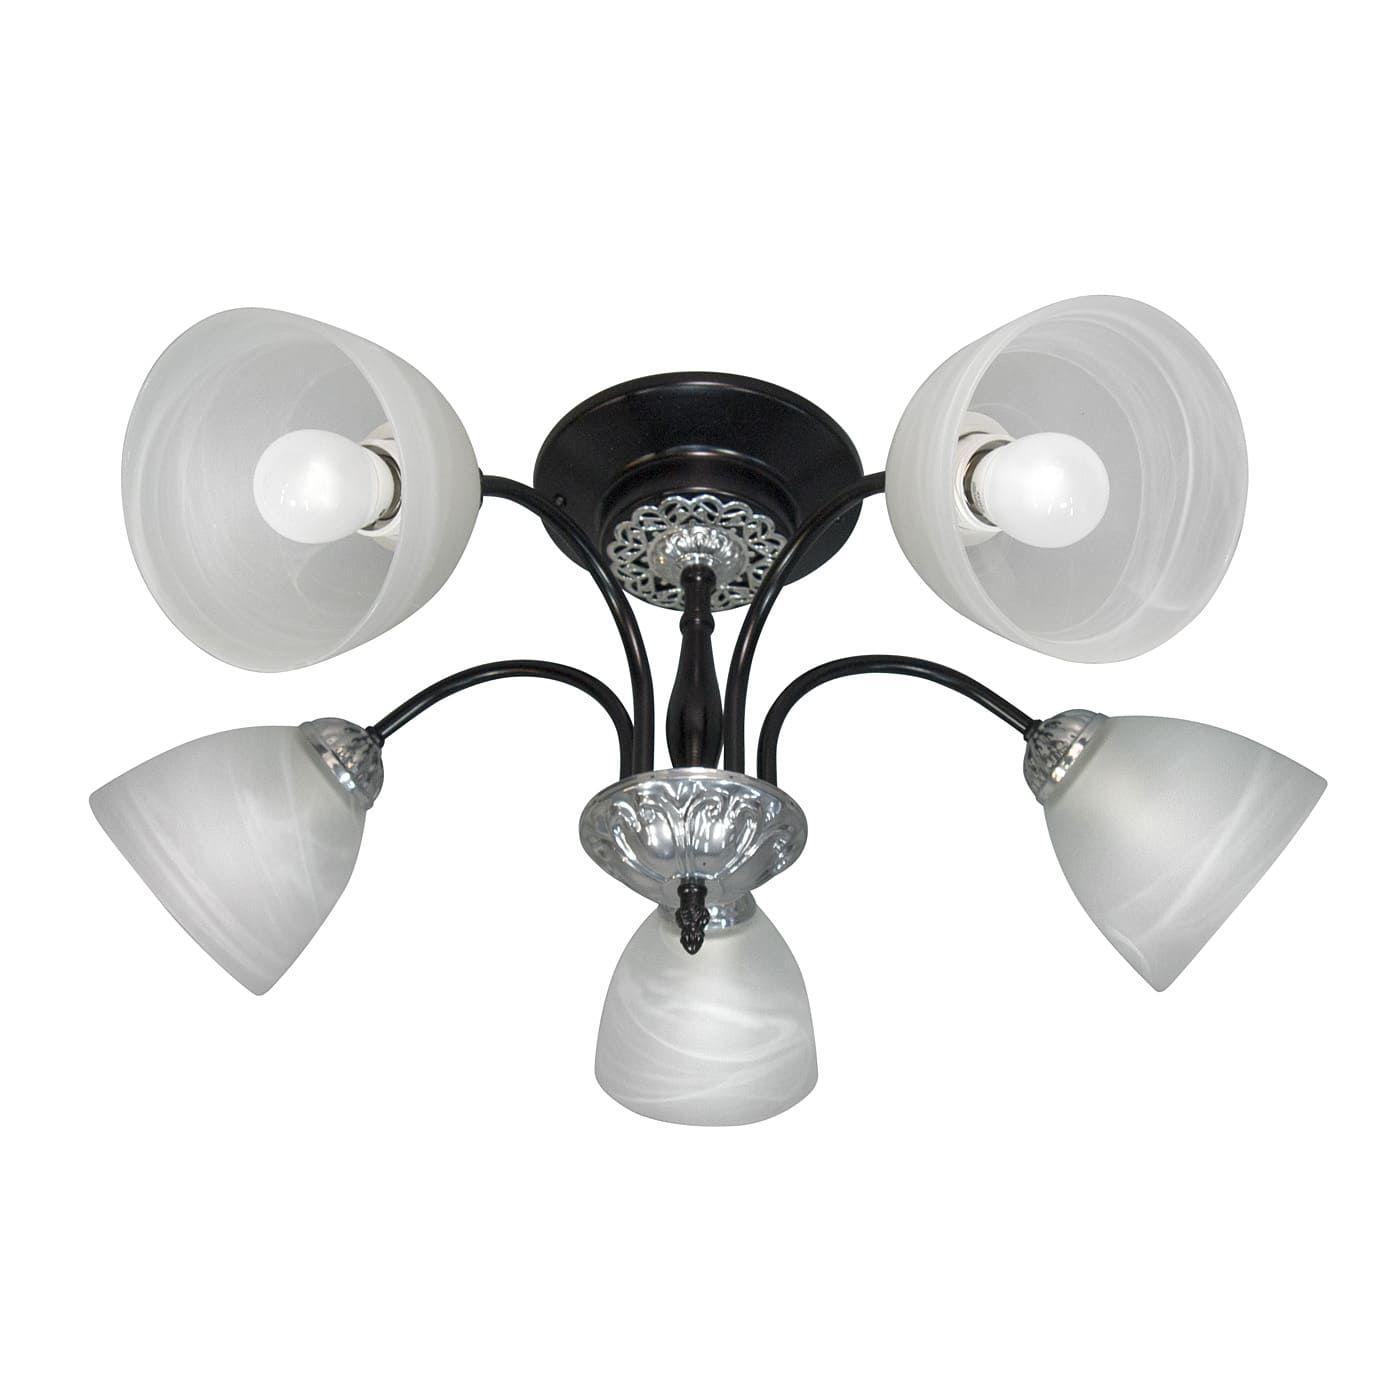 PETRASVET / Ceiling chandelier S2406-5, 5xE27 max. 60W